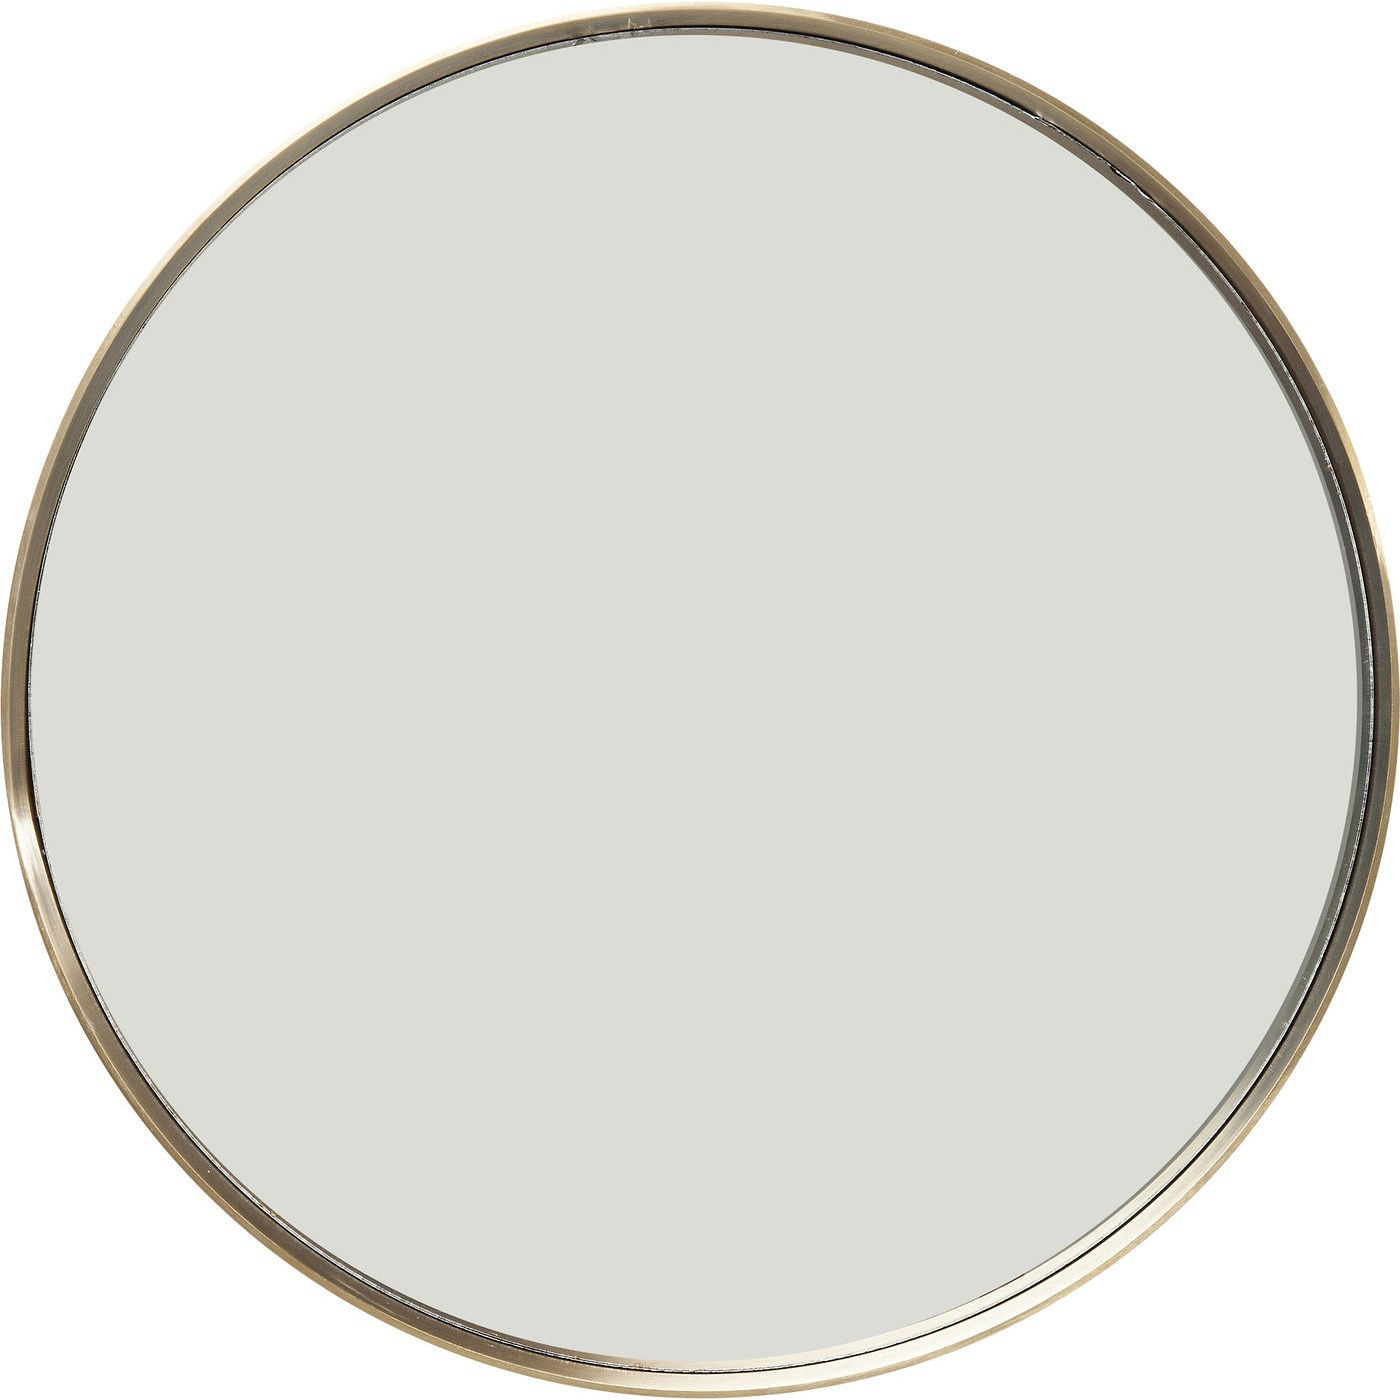 Miroir rond en métal doré D60